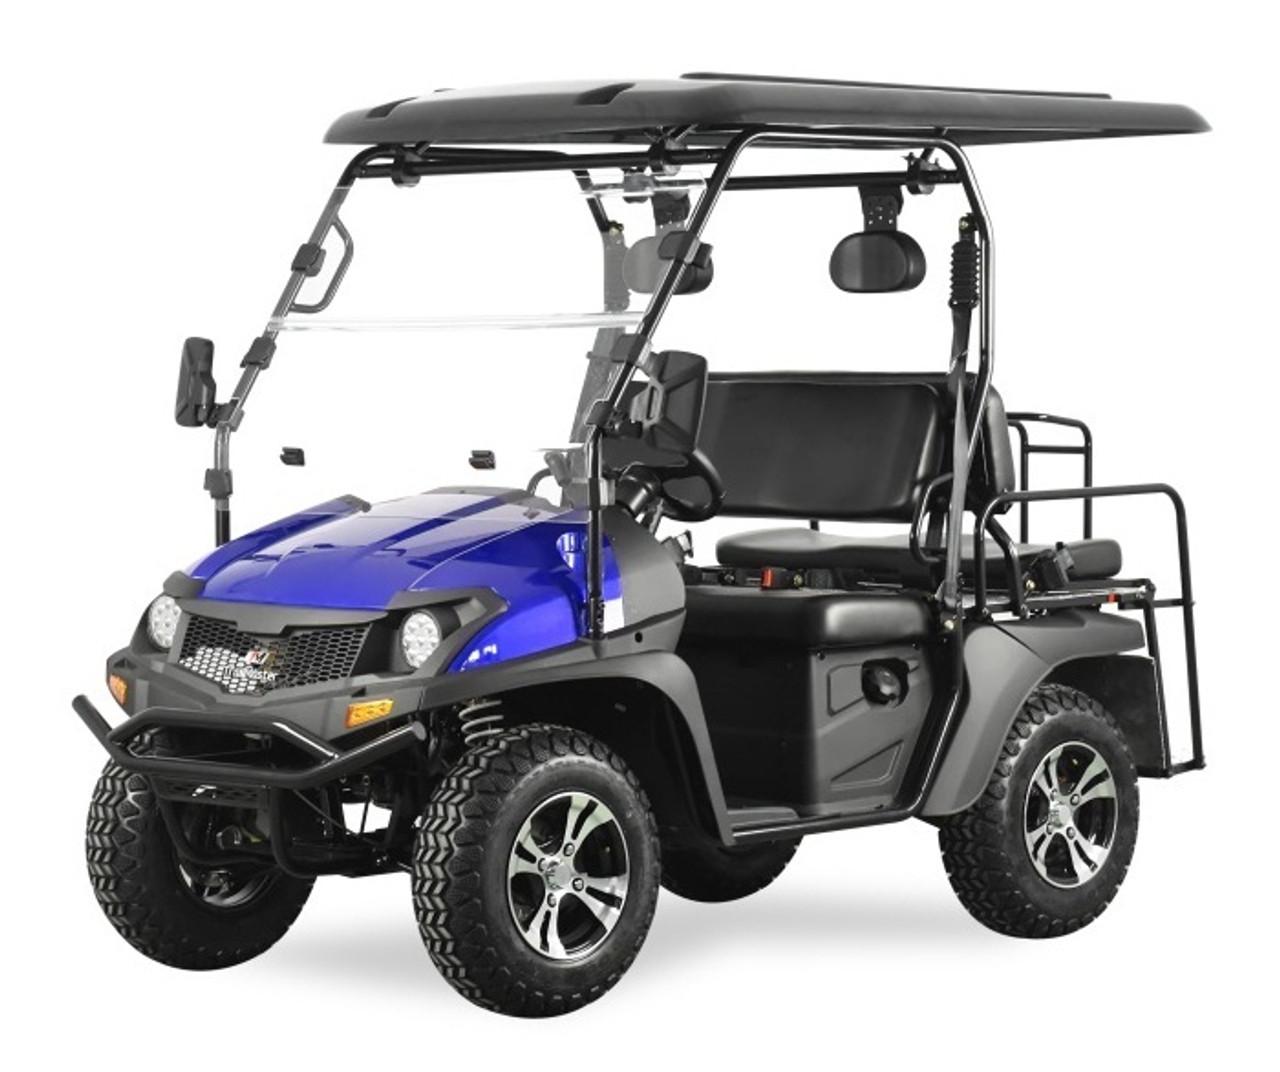 New Trailmaster Taurus 200GX UTV, 4-Stroke, Single Cylinder, Air and Oil Cooled